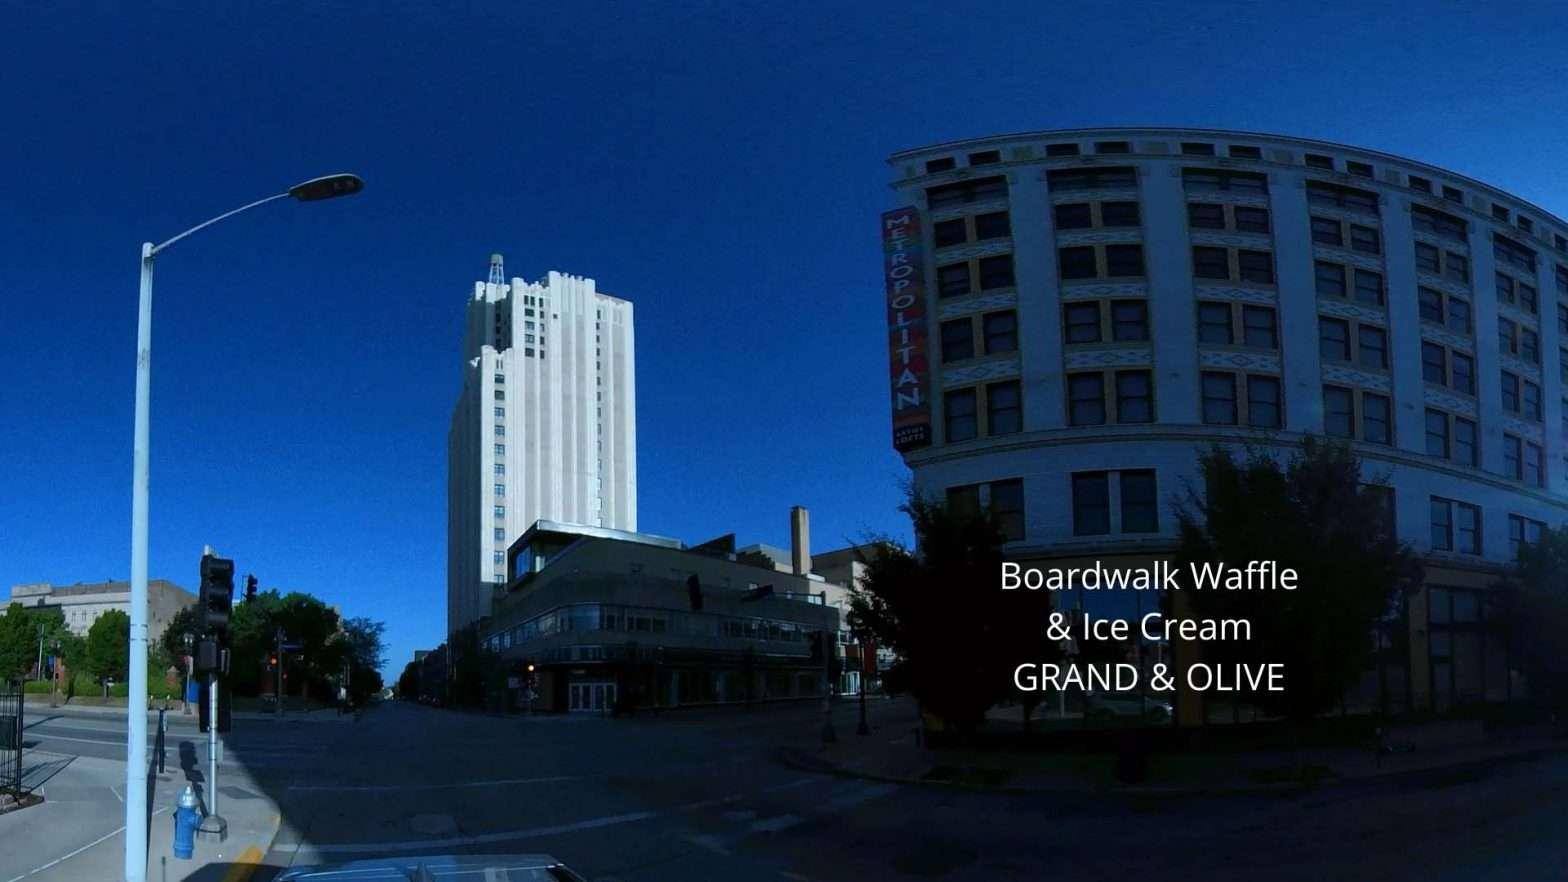 Boardwalk Waffles and Ice Cream Grand Olive.jpg